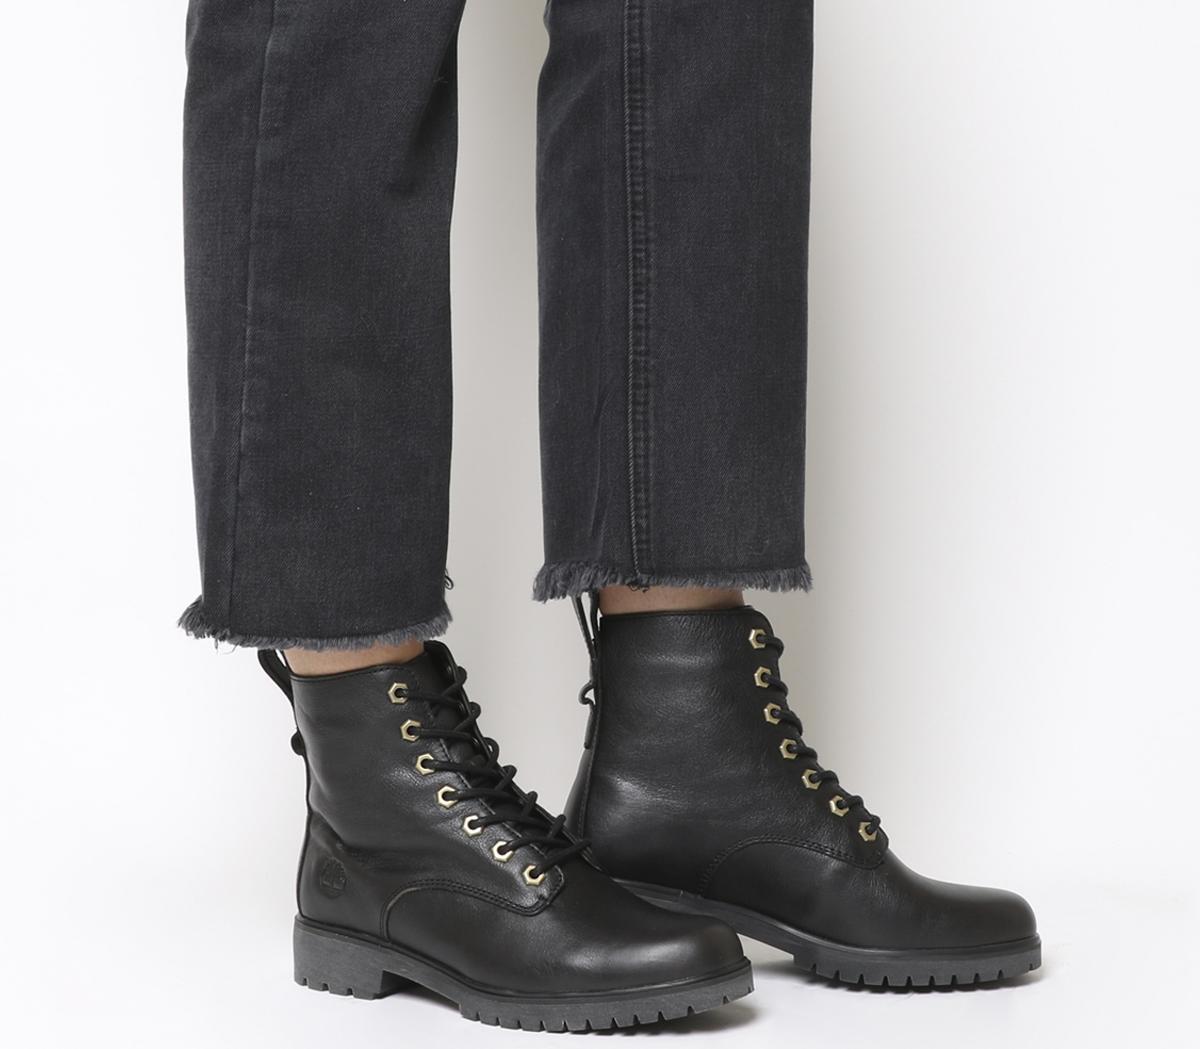 Timberland Lux Boots Black Journeyman